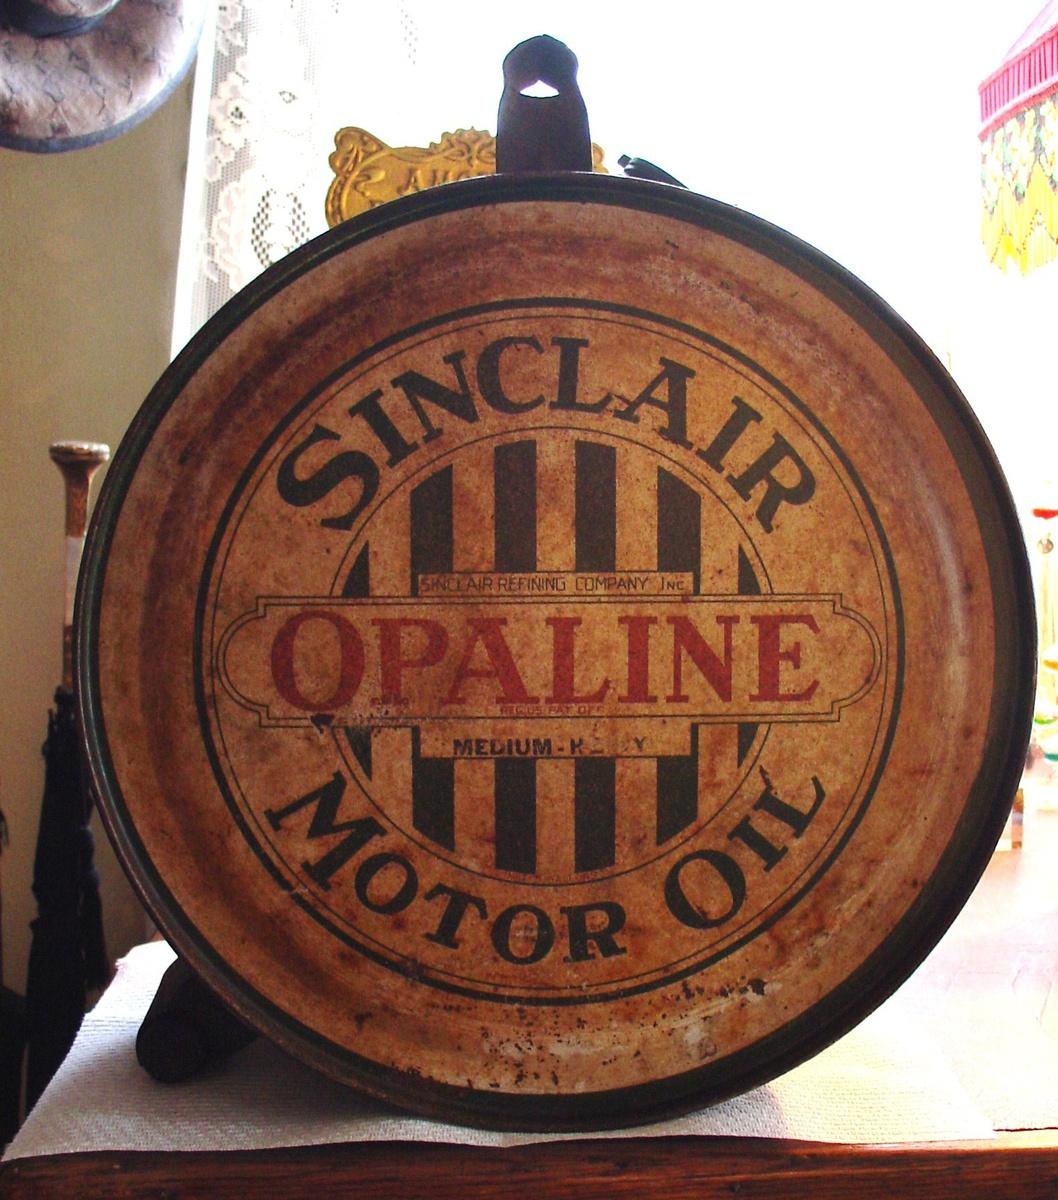 Sinclair Opaline Motor Oil...5 Gallon Oil Rocker Can...1920's | Collectors Weekly